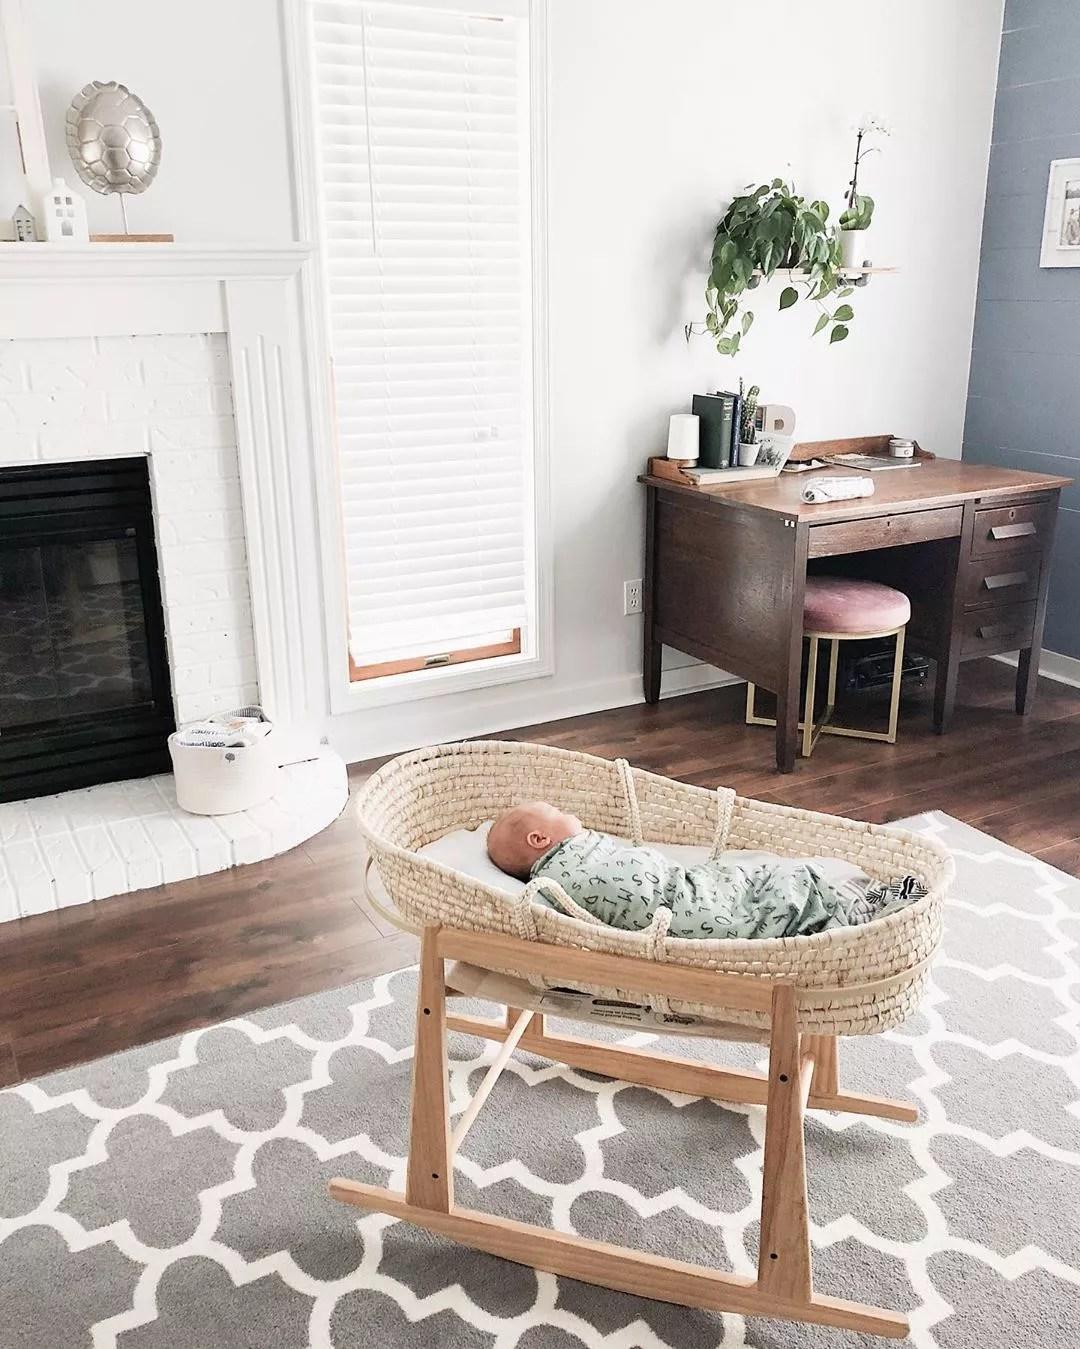 Baby sleeping in bassinet in living room. Photo by Instagram user @hellosparrows